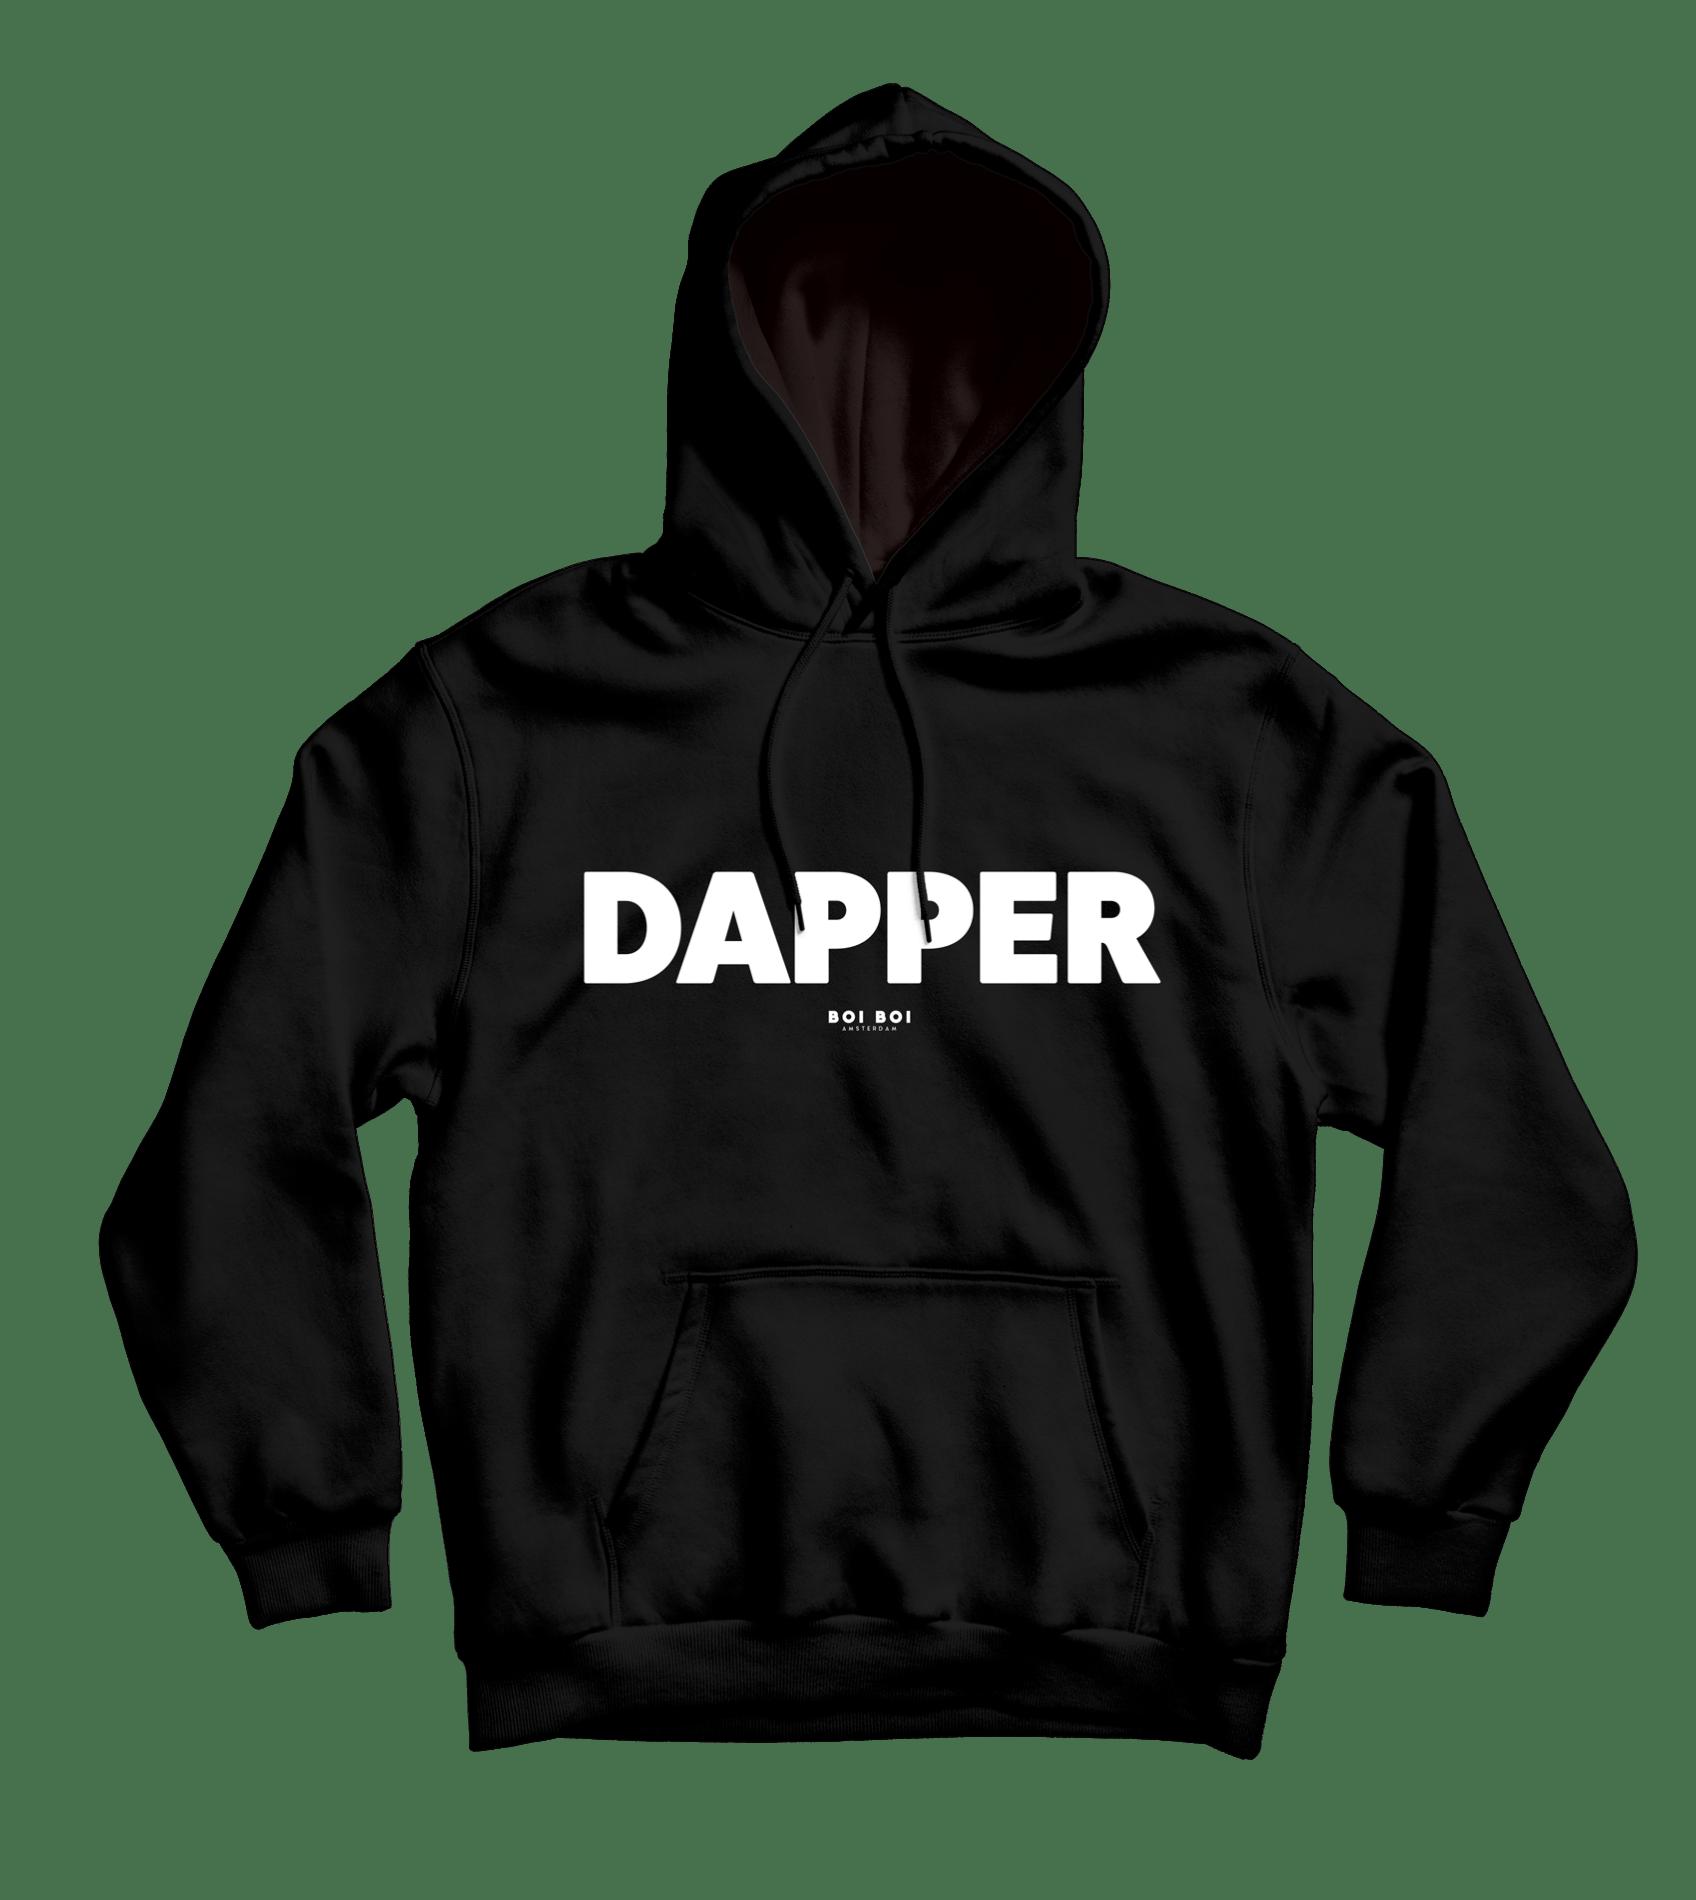 Dapper Hoodie Black